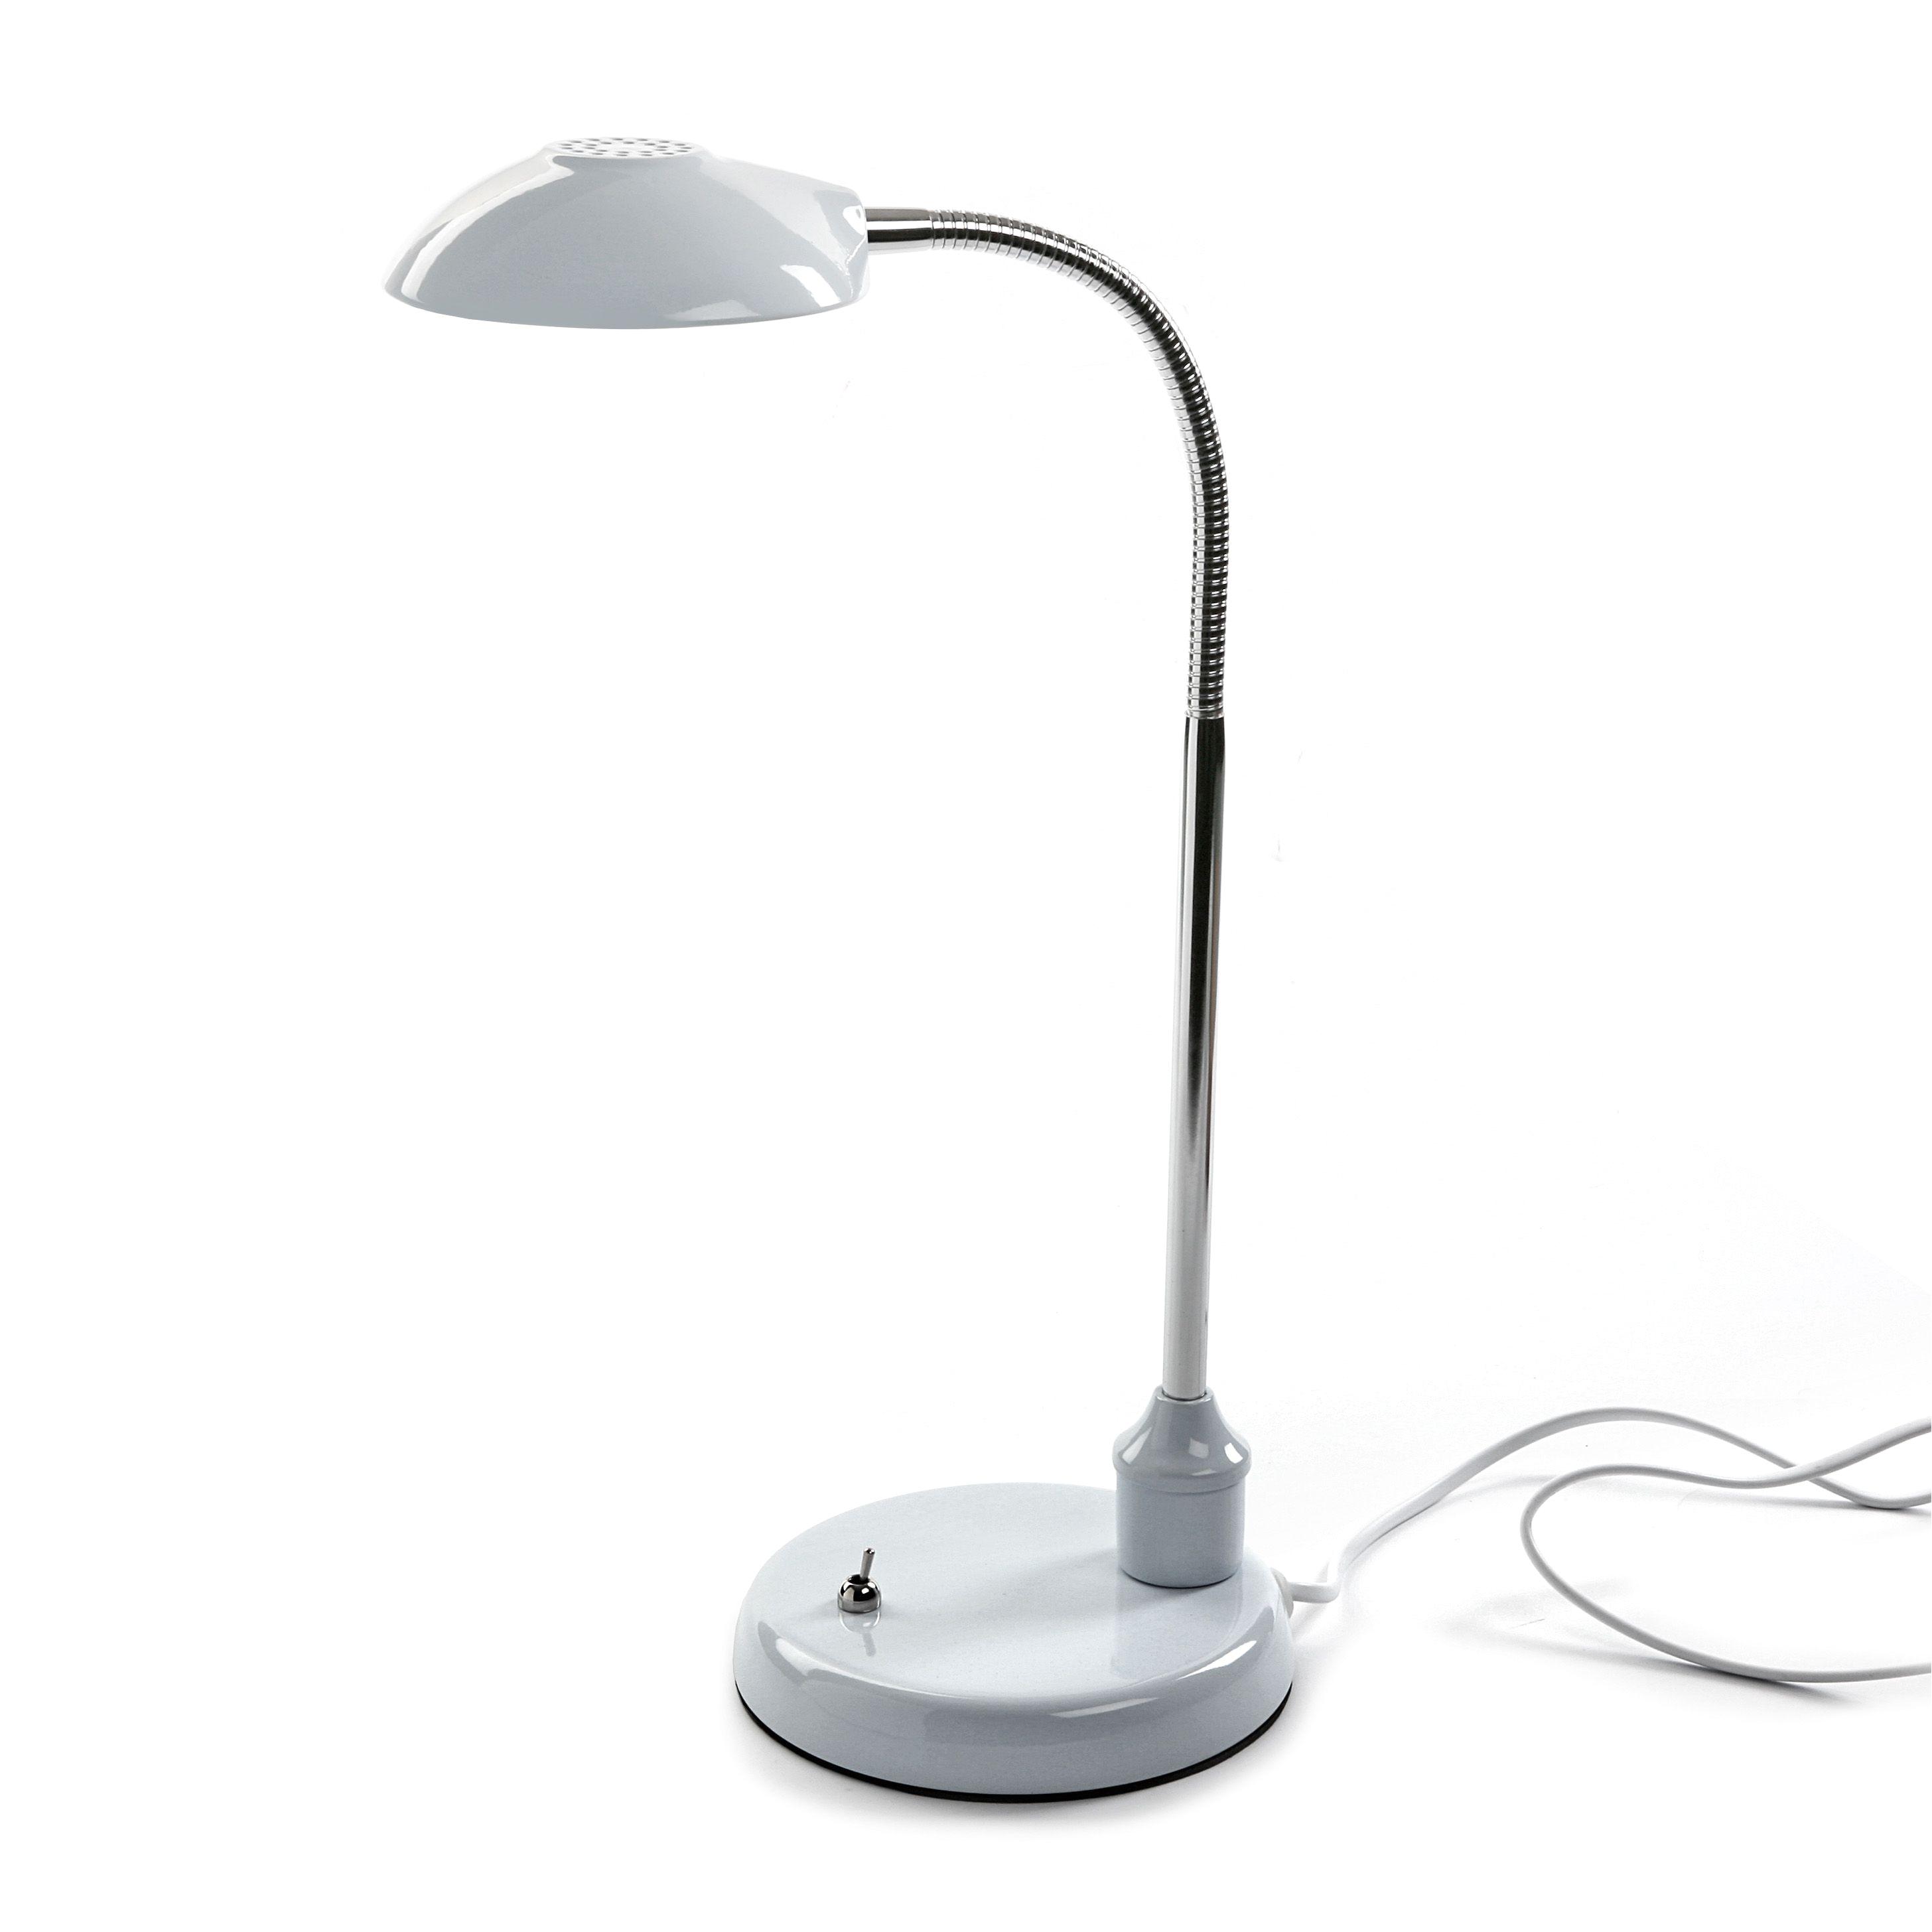 flexo minimal moderno con asta maleable en cualquier direccia³n lampara iluminacion casa